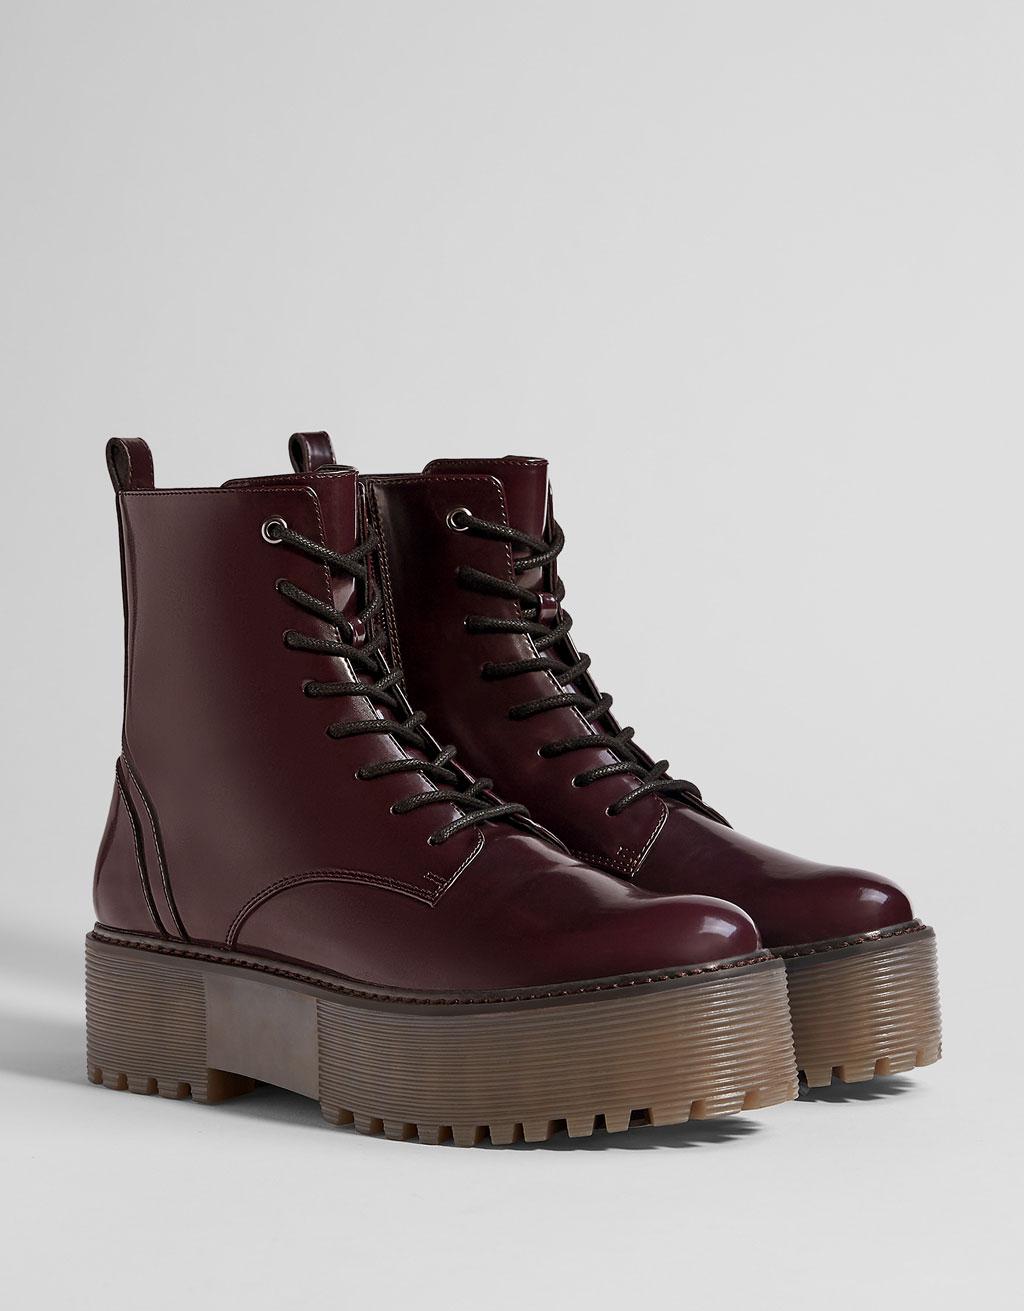 Chaussure compensée bershka